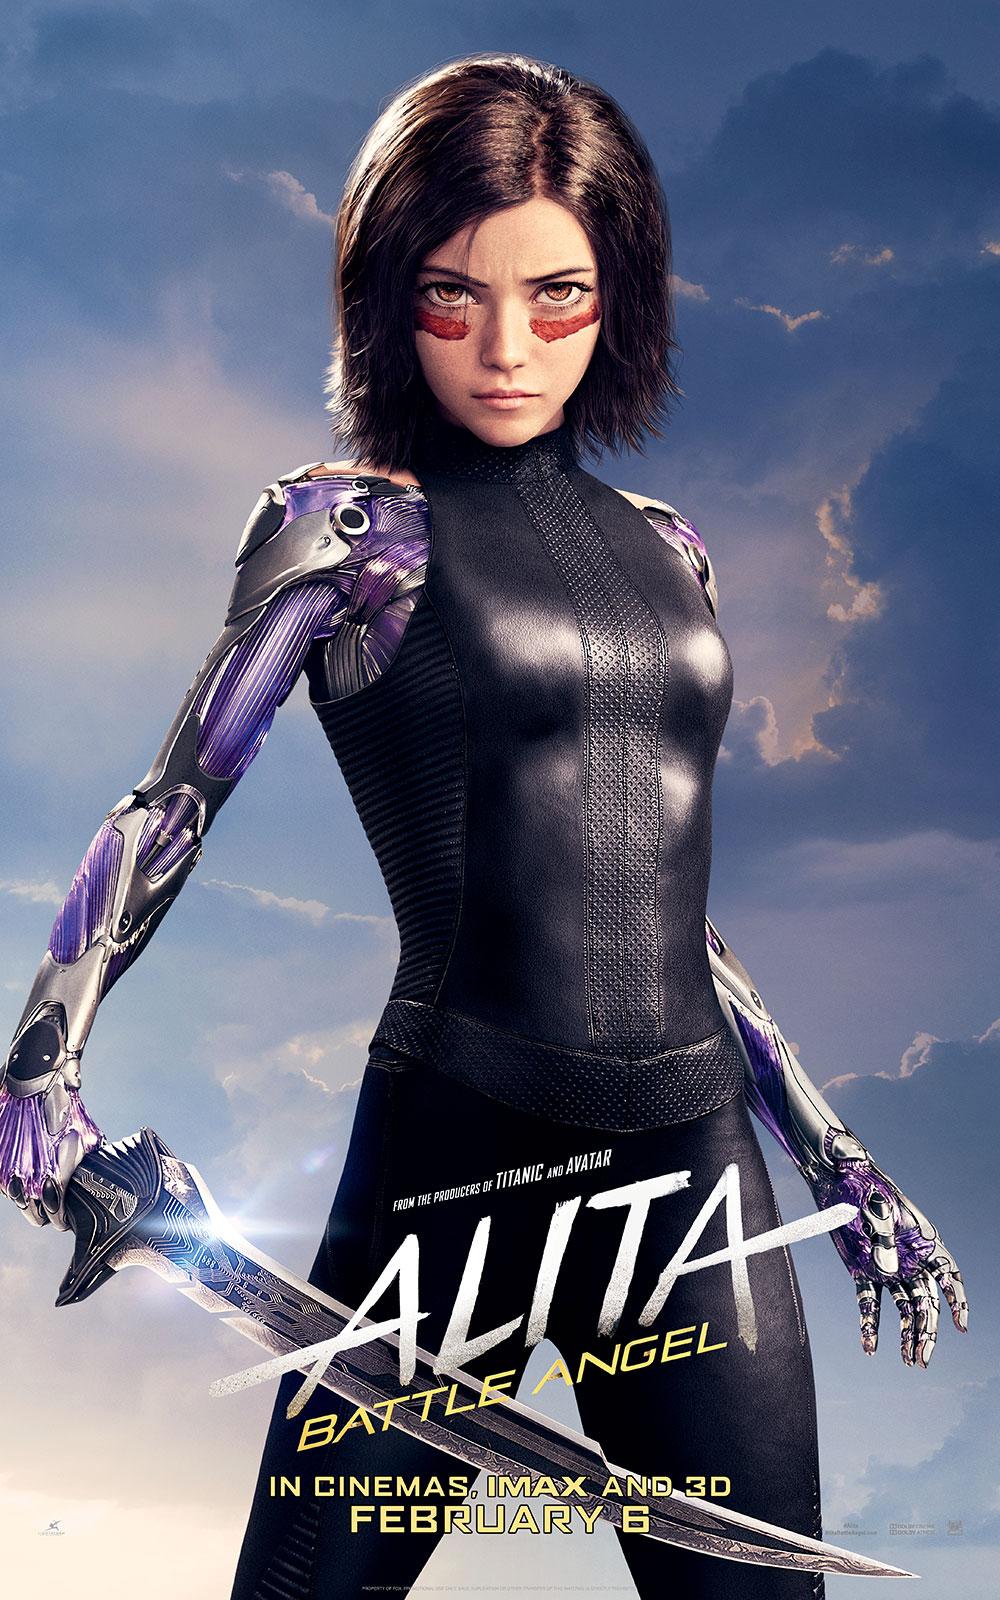 Alita Battle Angel 2019 Mindcraft